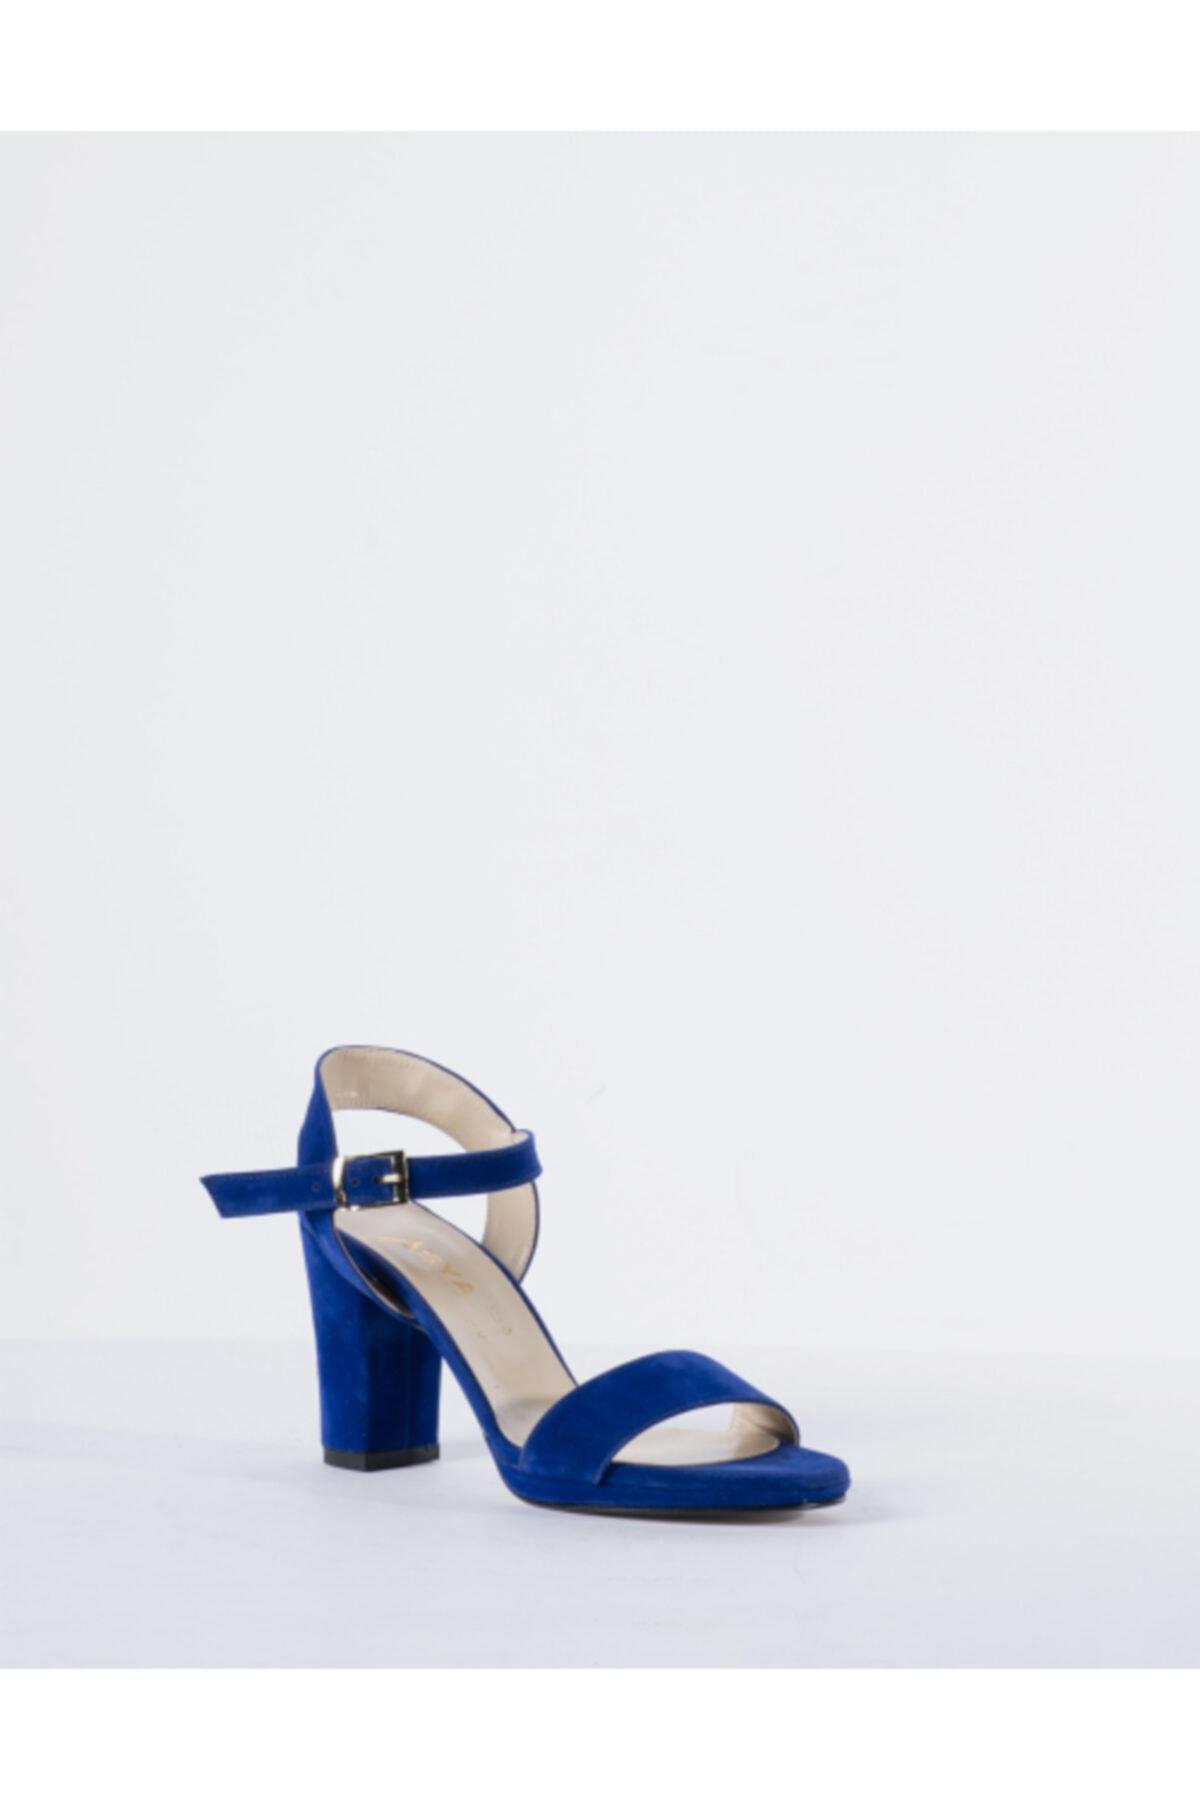 Vision Kadın LacivertTopuklu Ayakkabı 2